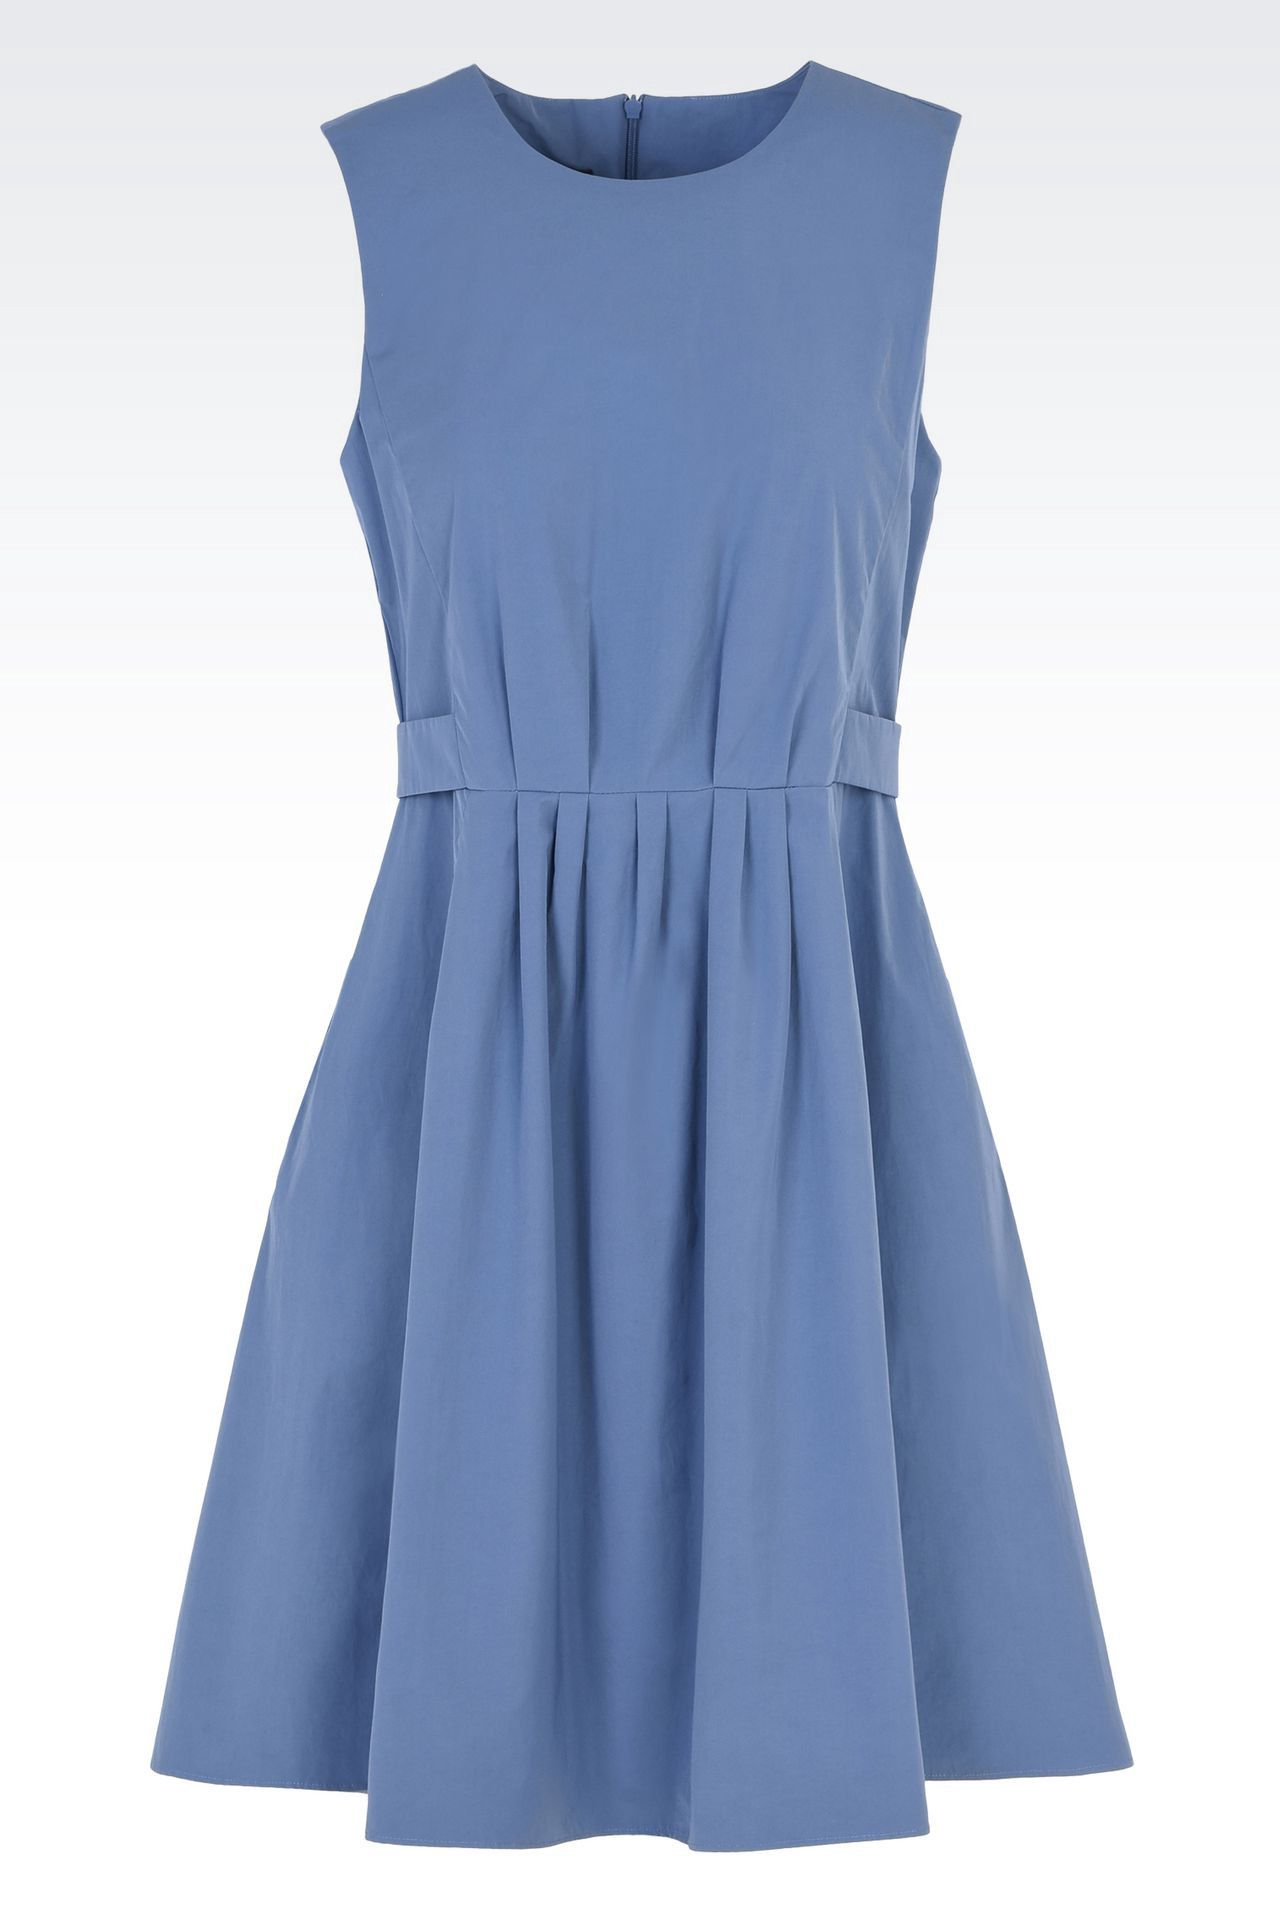 EMPORIO ARMANI SHORT DRESS. #emporioarmani #cloth #